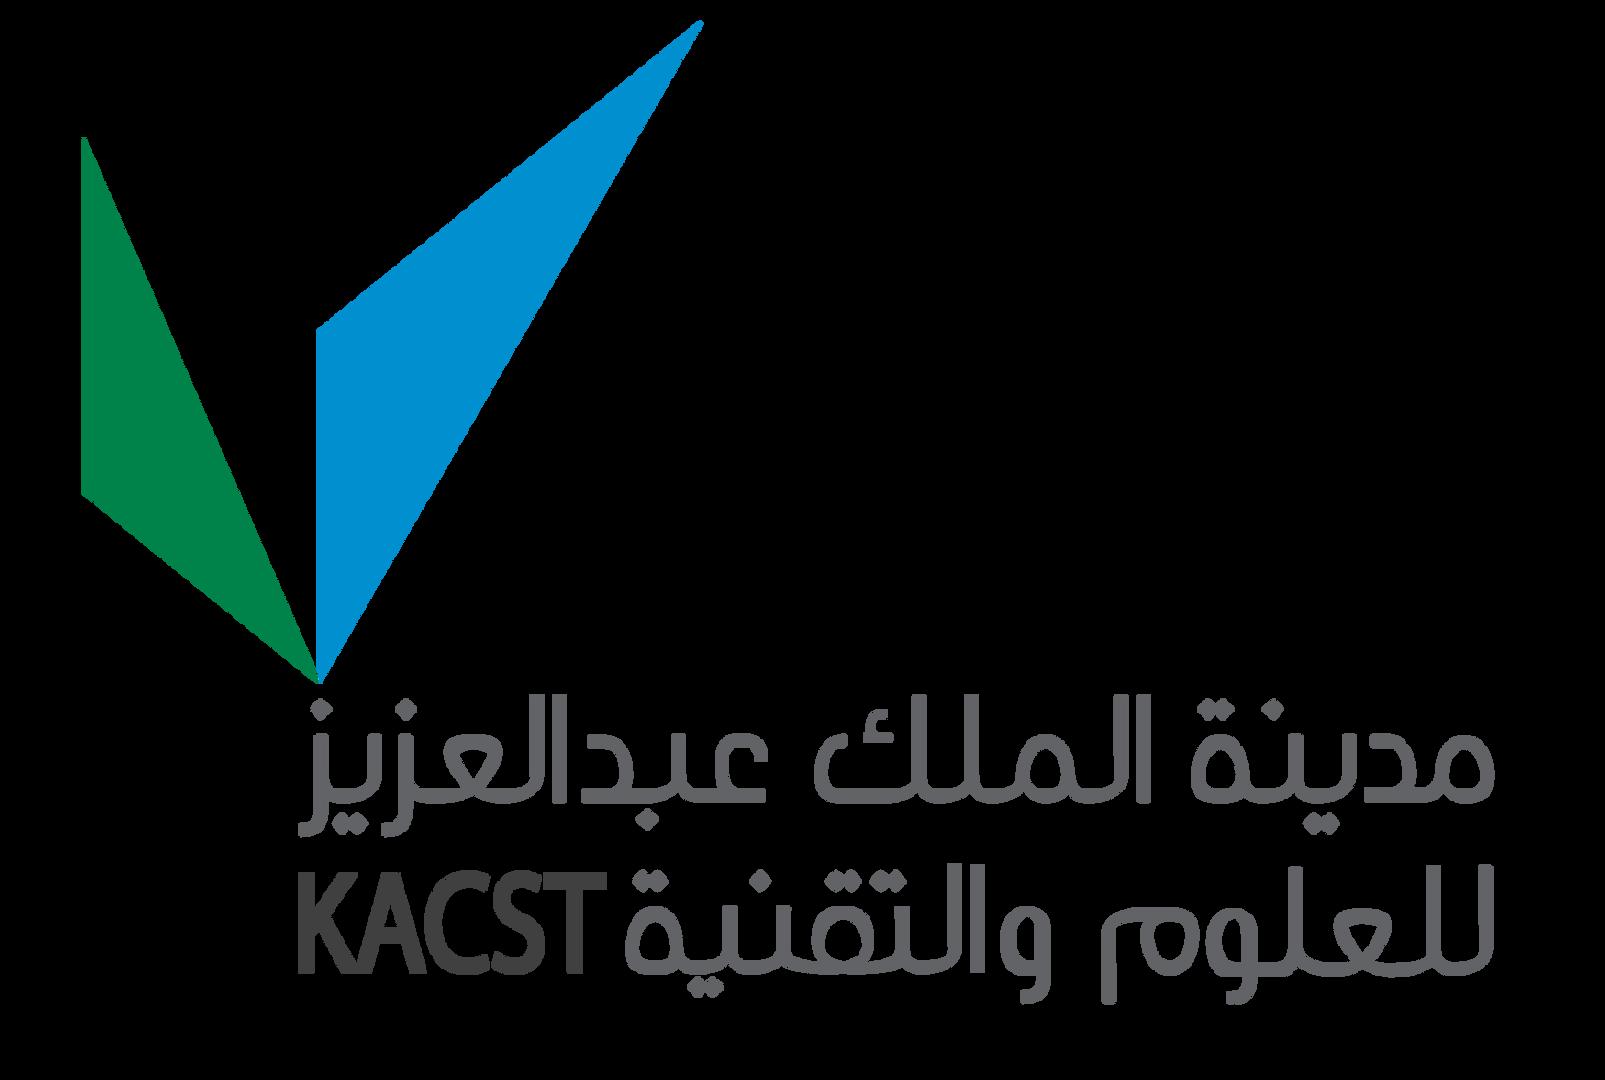 KACST-01.png